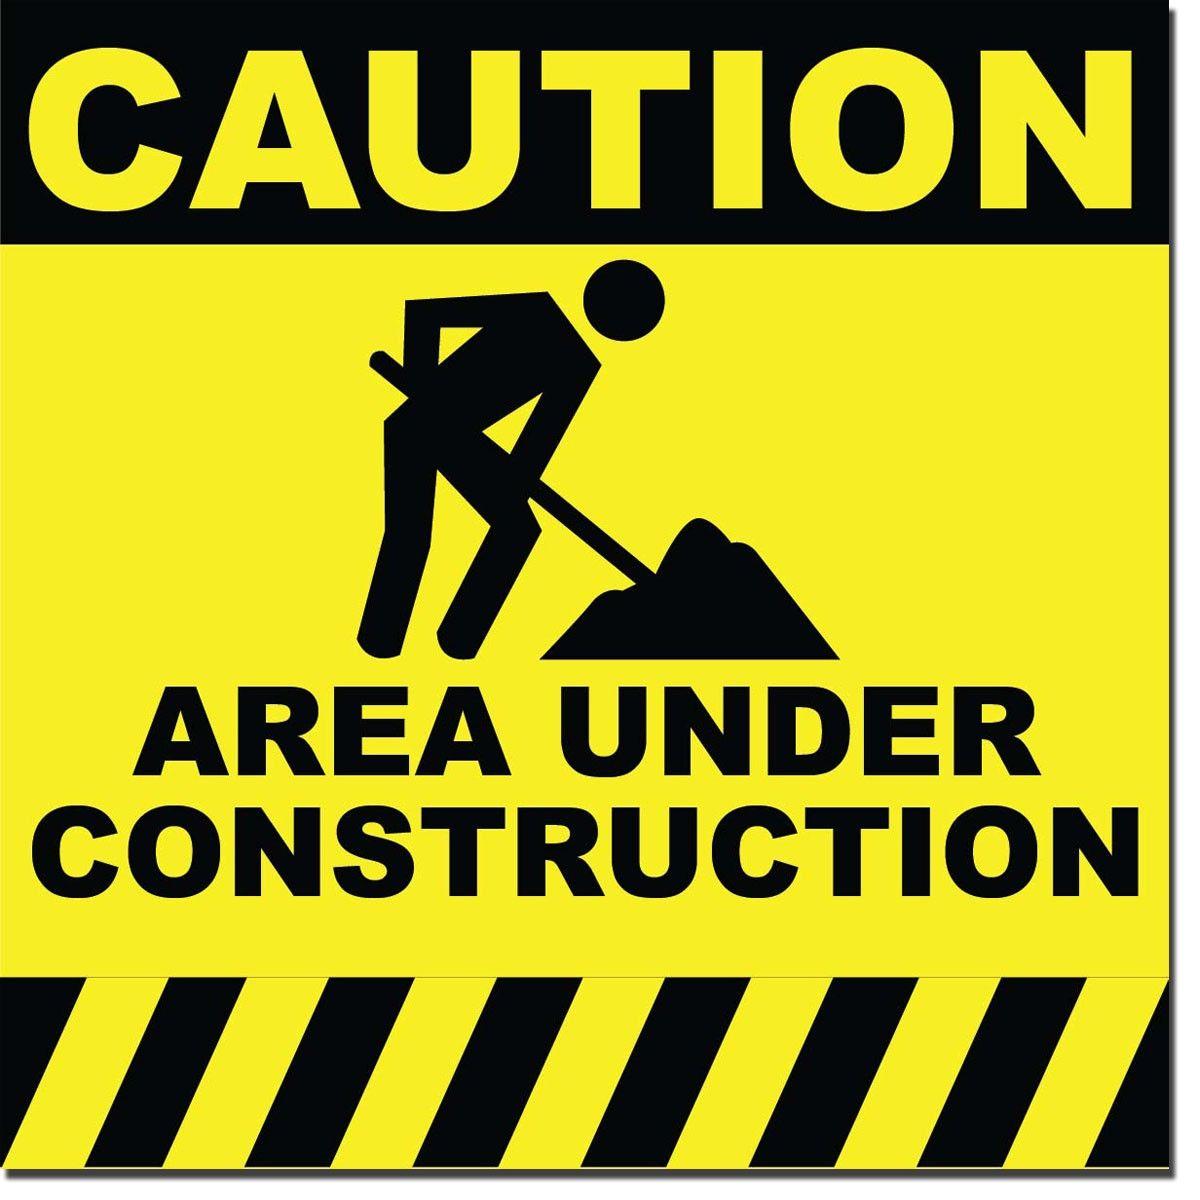 Construction warning signs clipart clip art freeuse library Clip Art: Construction Signs Clip Art | Kids Birthday party ... clip art freeuse library